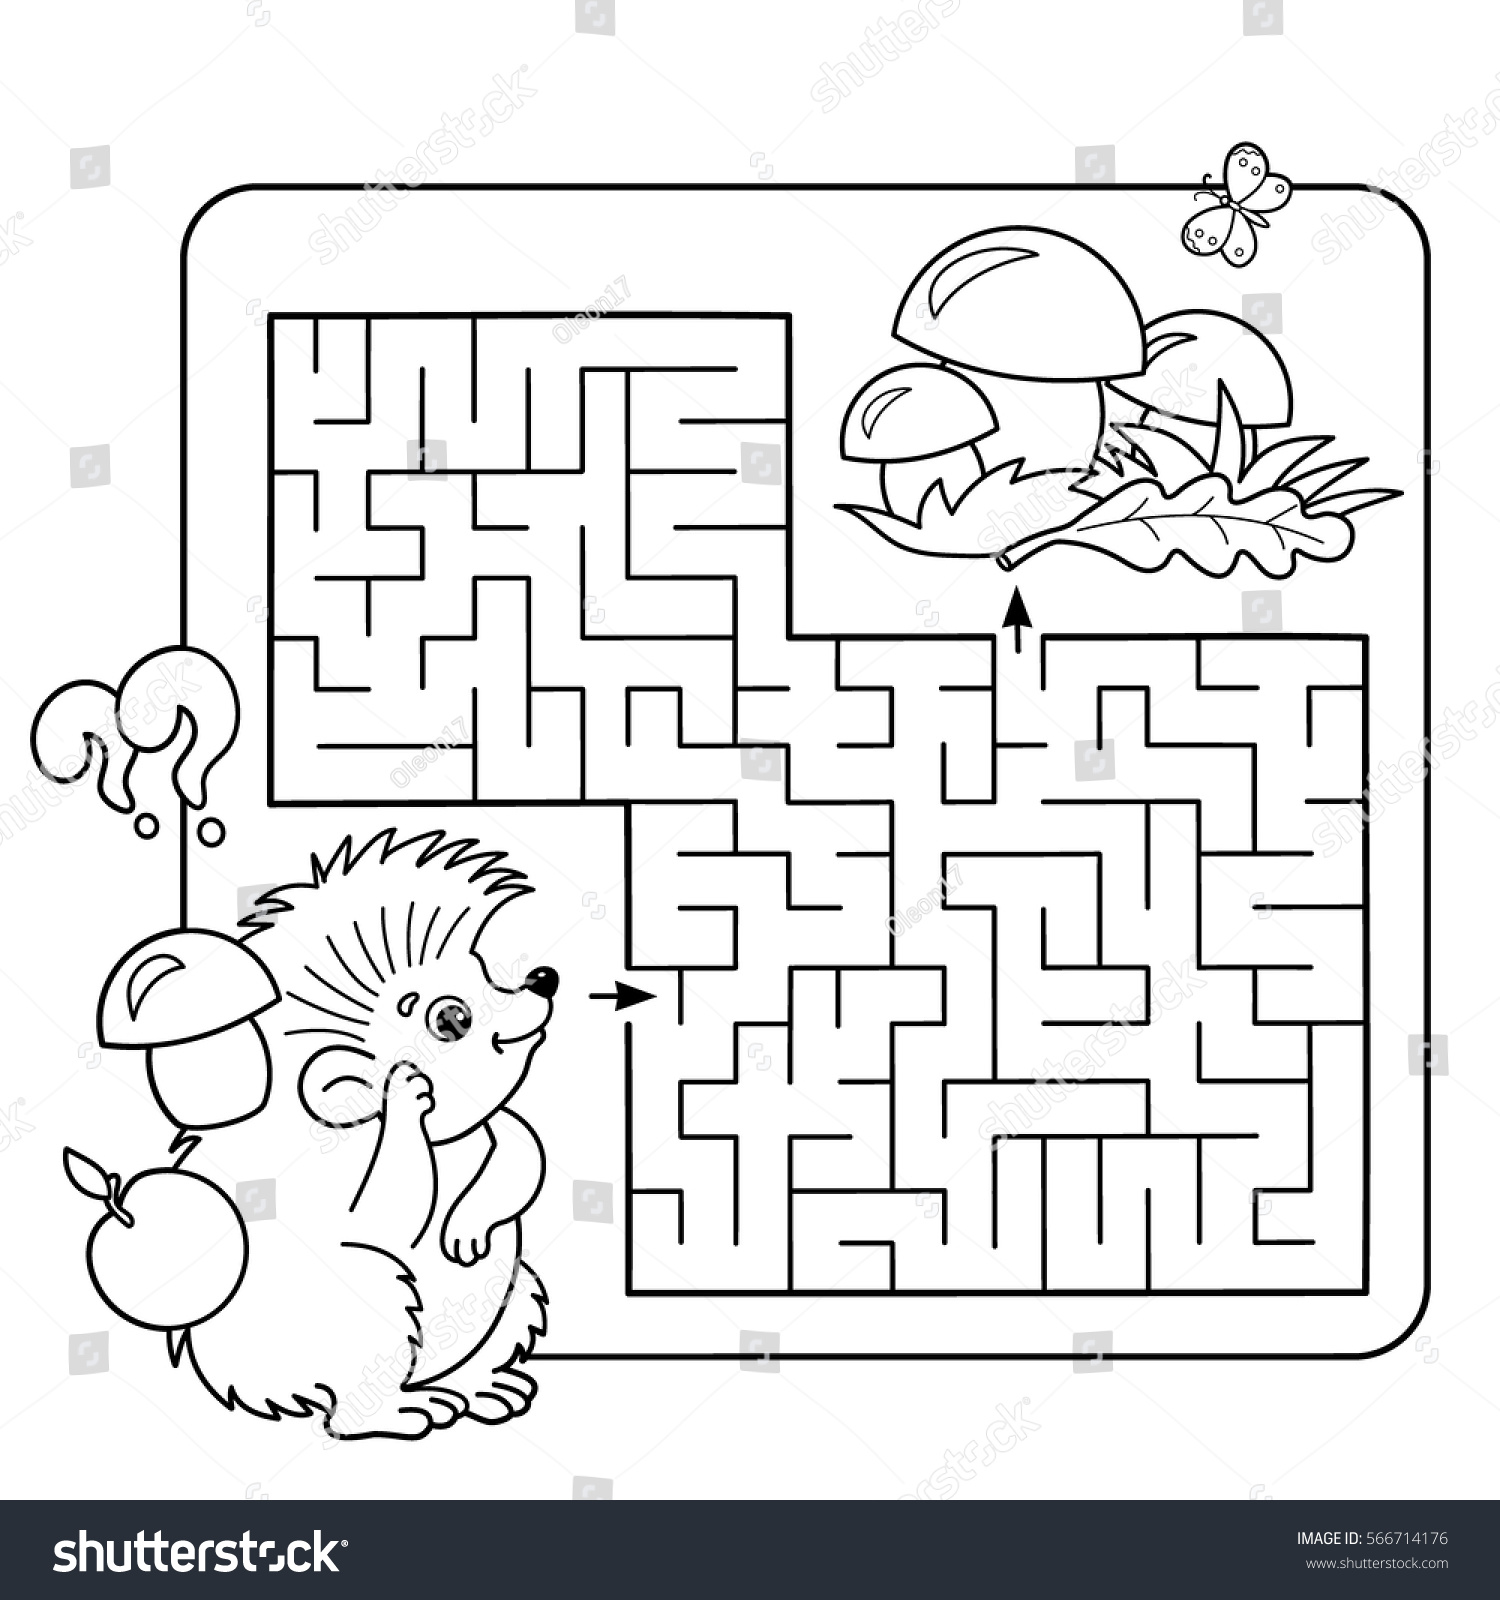 Cartoon Vector Illustration Education Maze Labyrinth Stock Vector ...